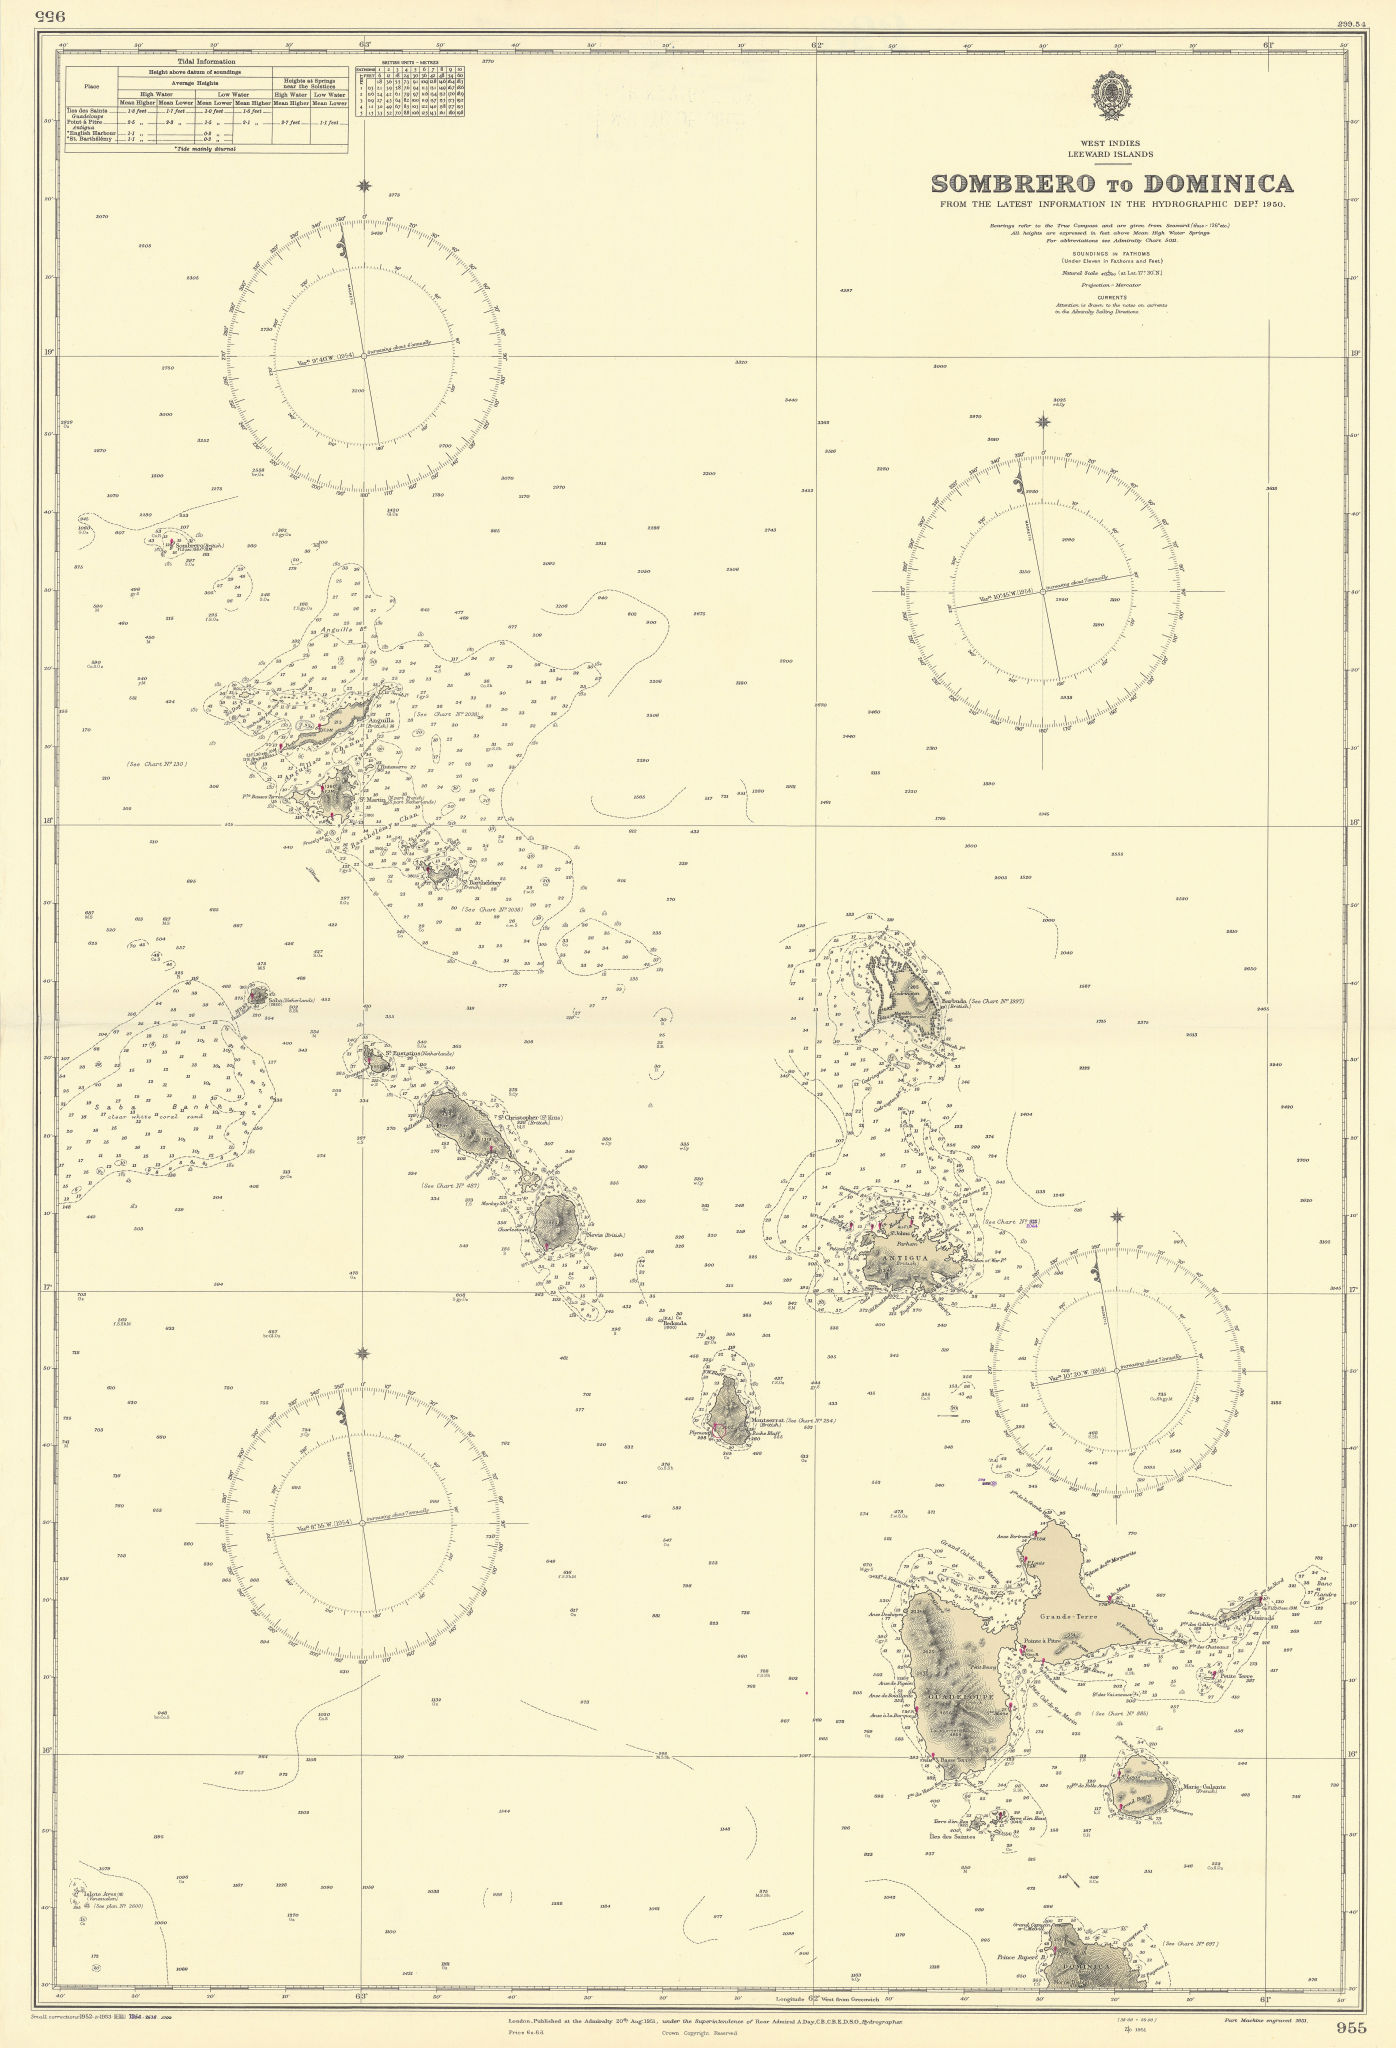 Leeward Islands Antigua Guadeloupe St Kitts Barts ADMIRALTY chart 1954 old map